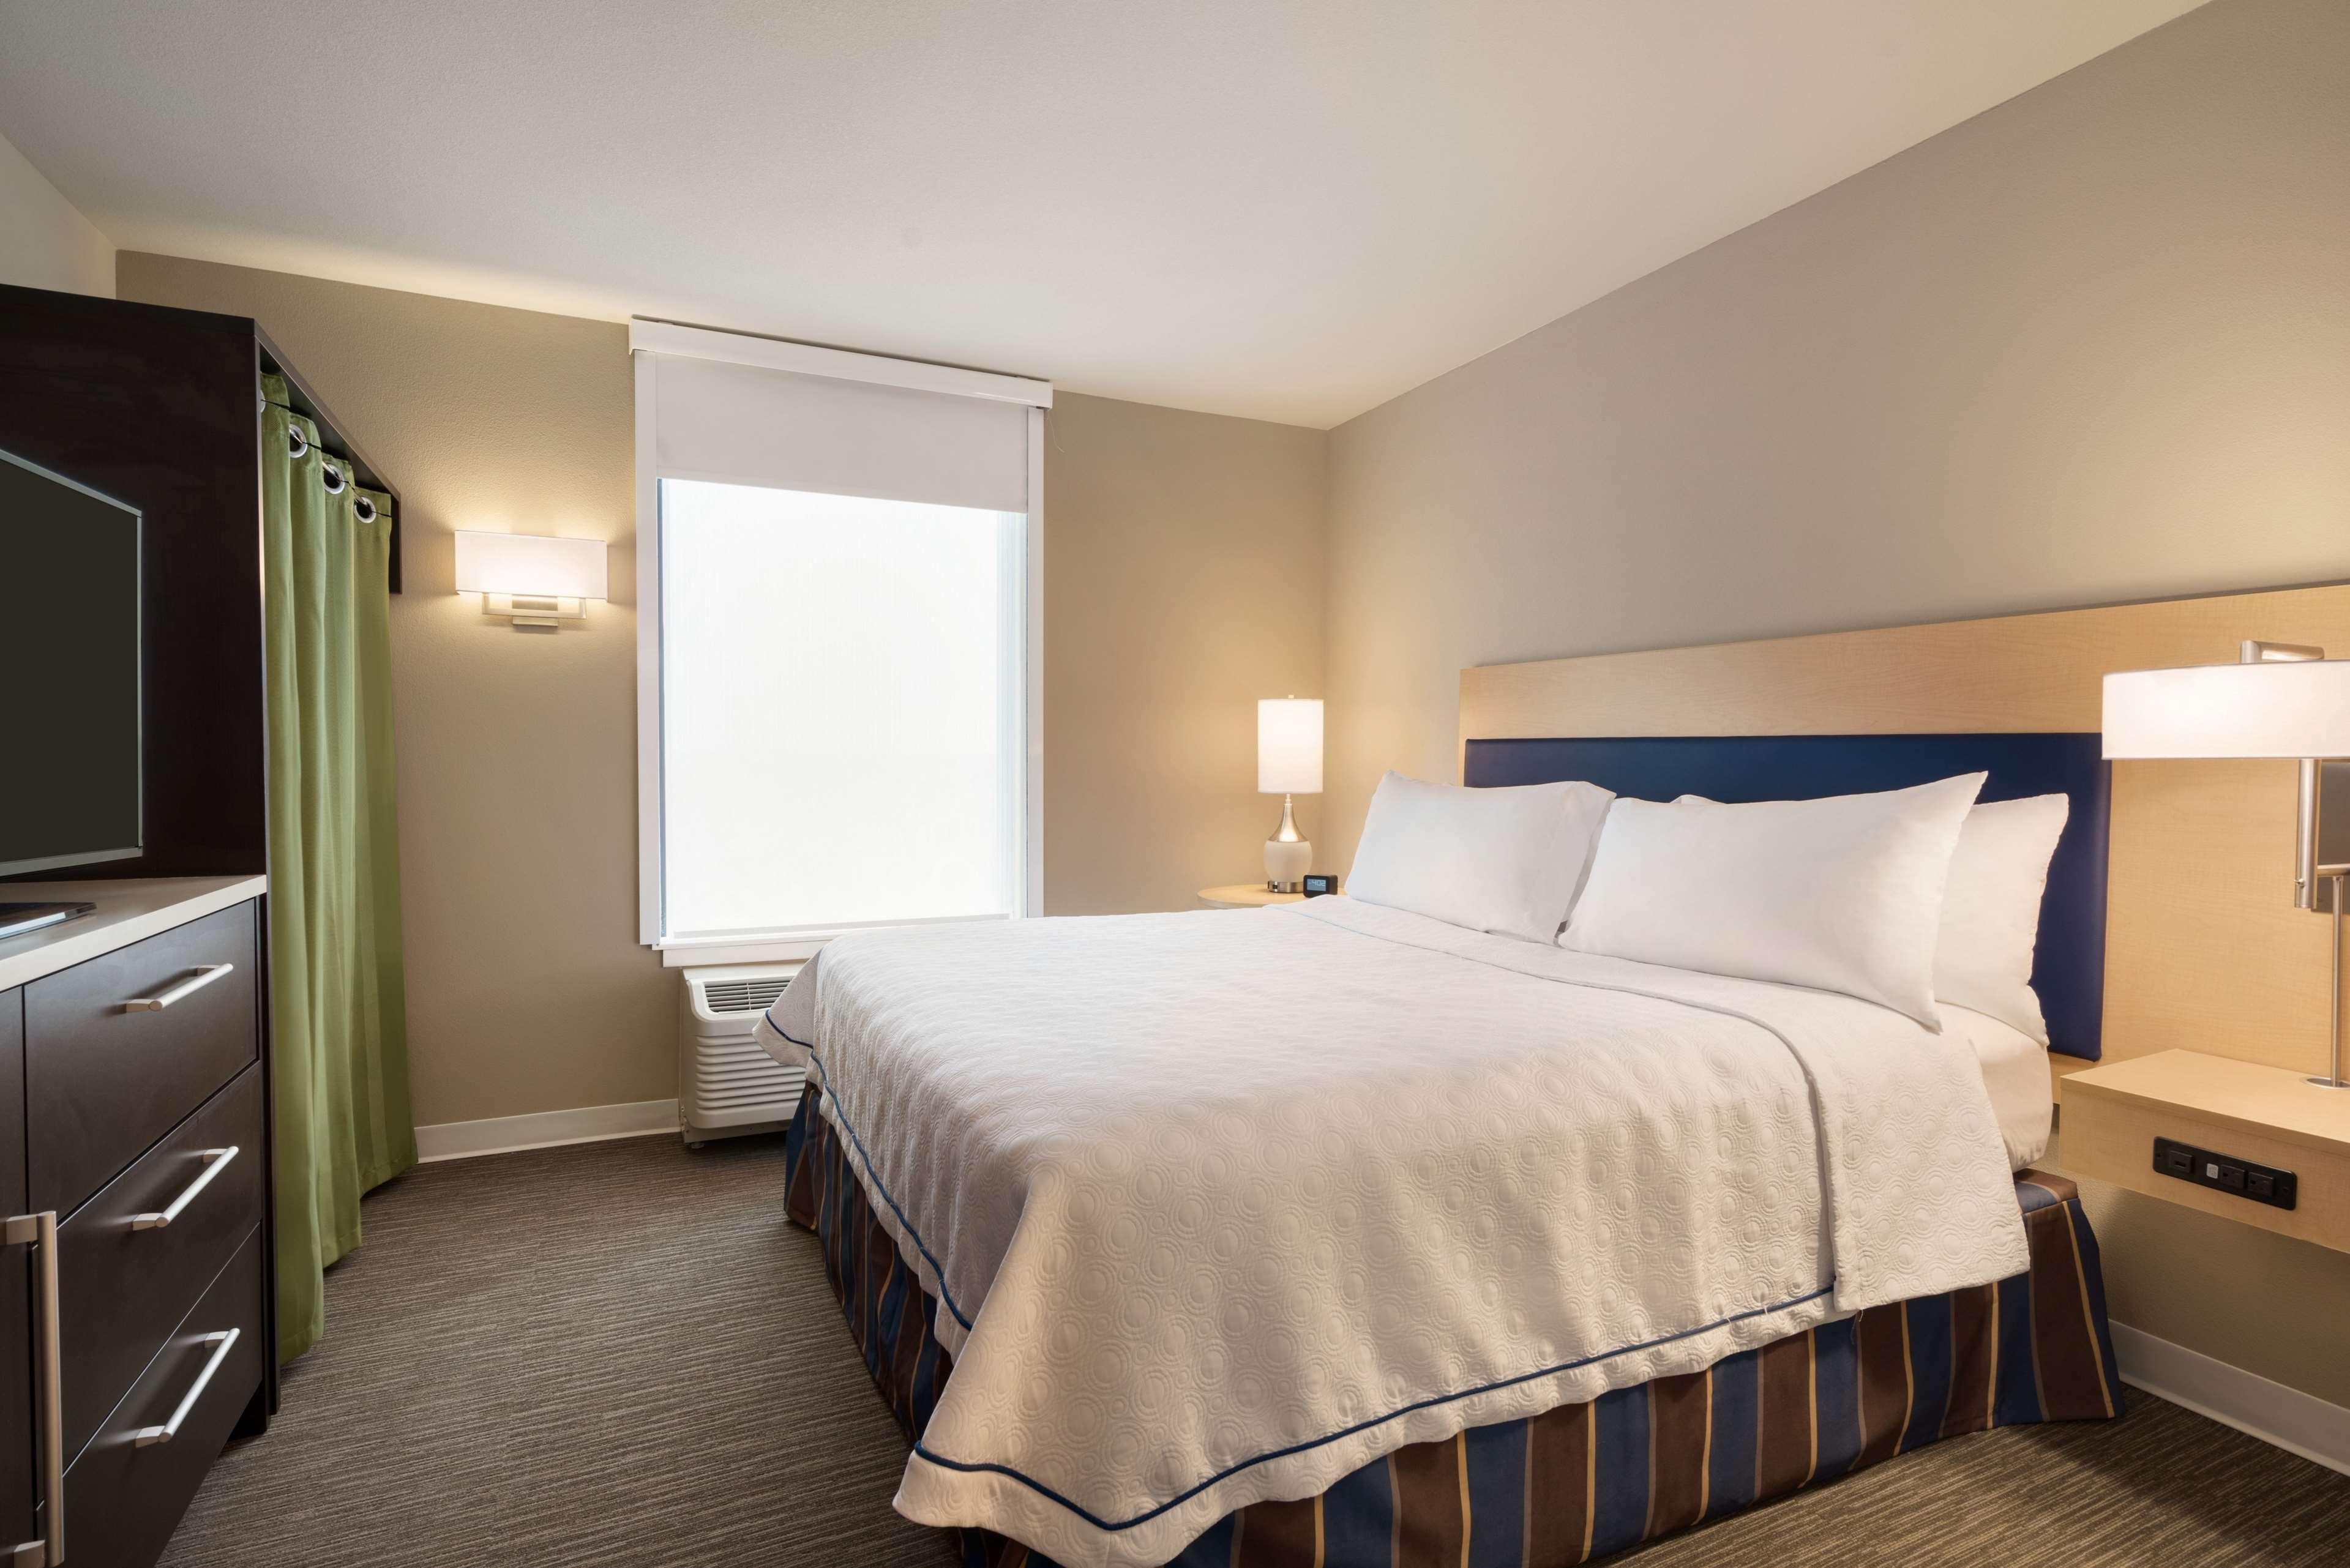 Home2 Suites by Hilton Leavenworth Downtown image 25